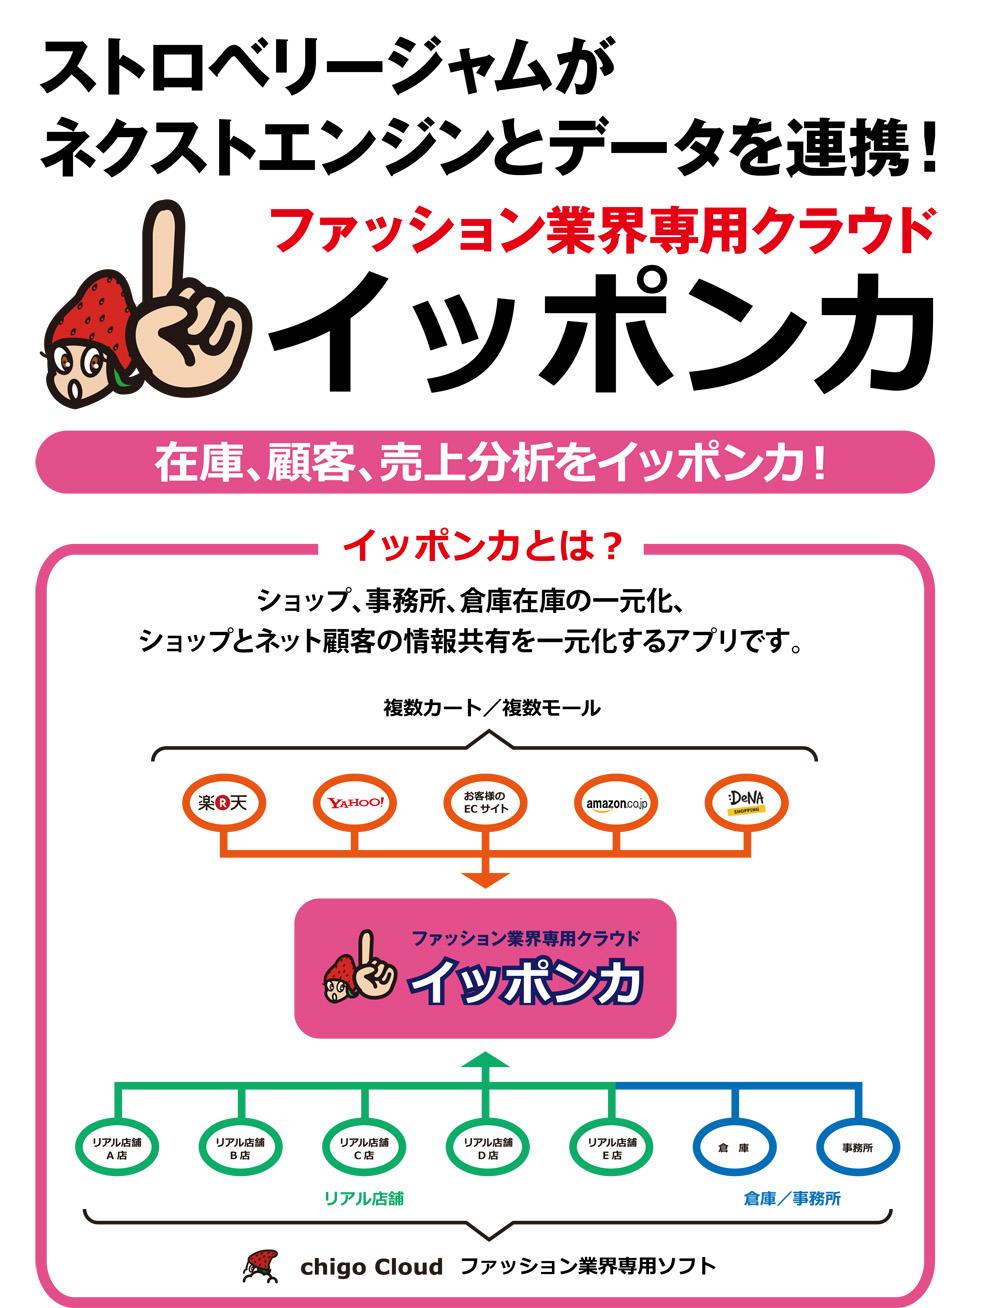 StrawberryJamイッポンカネクスト